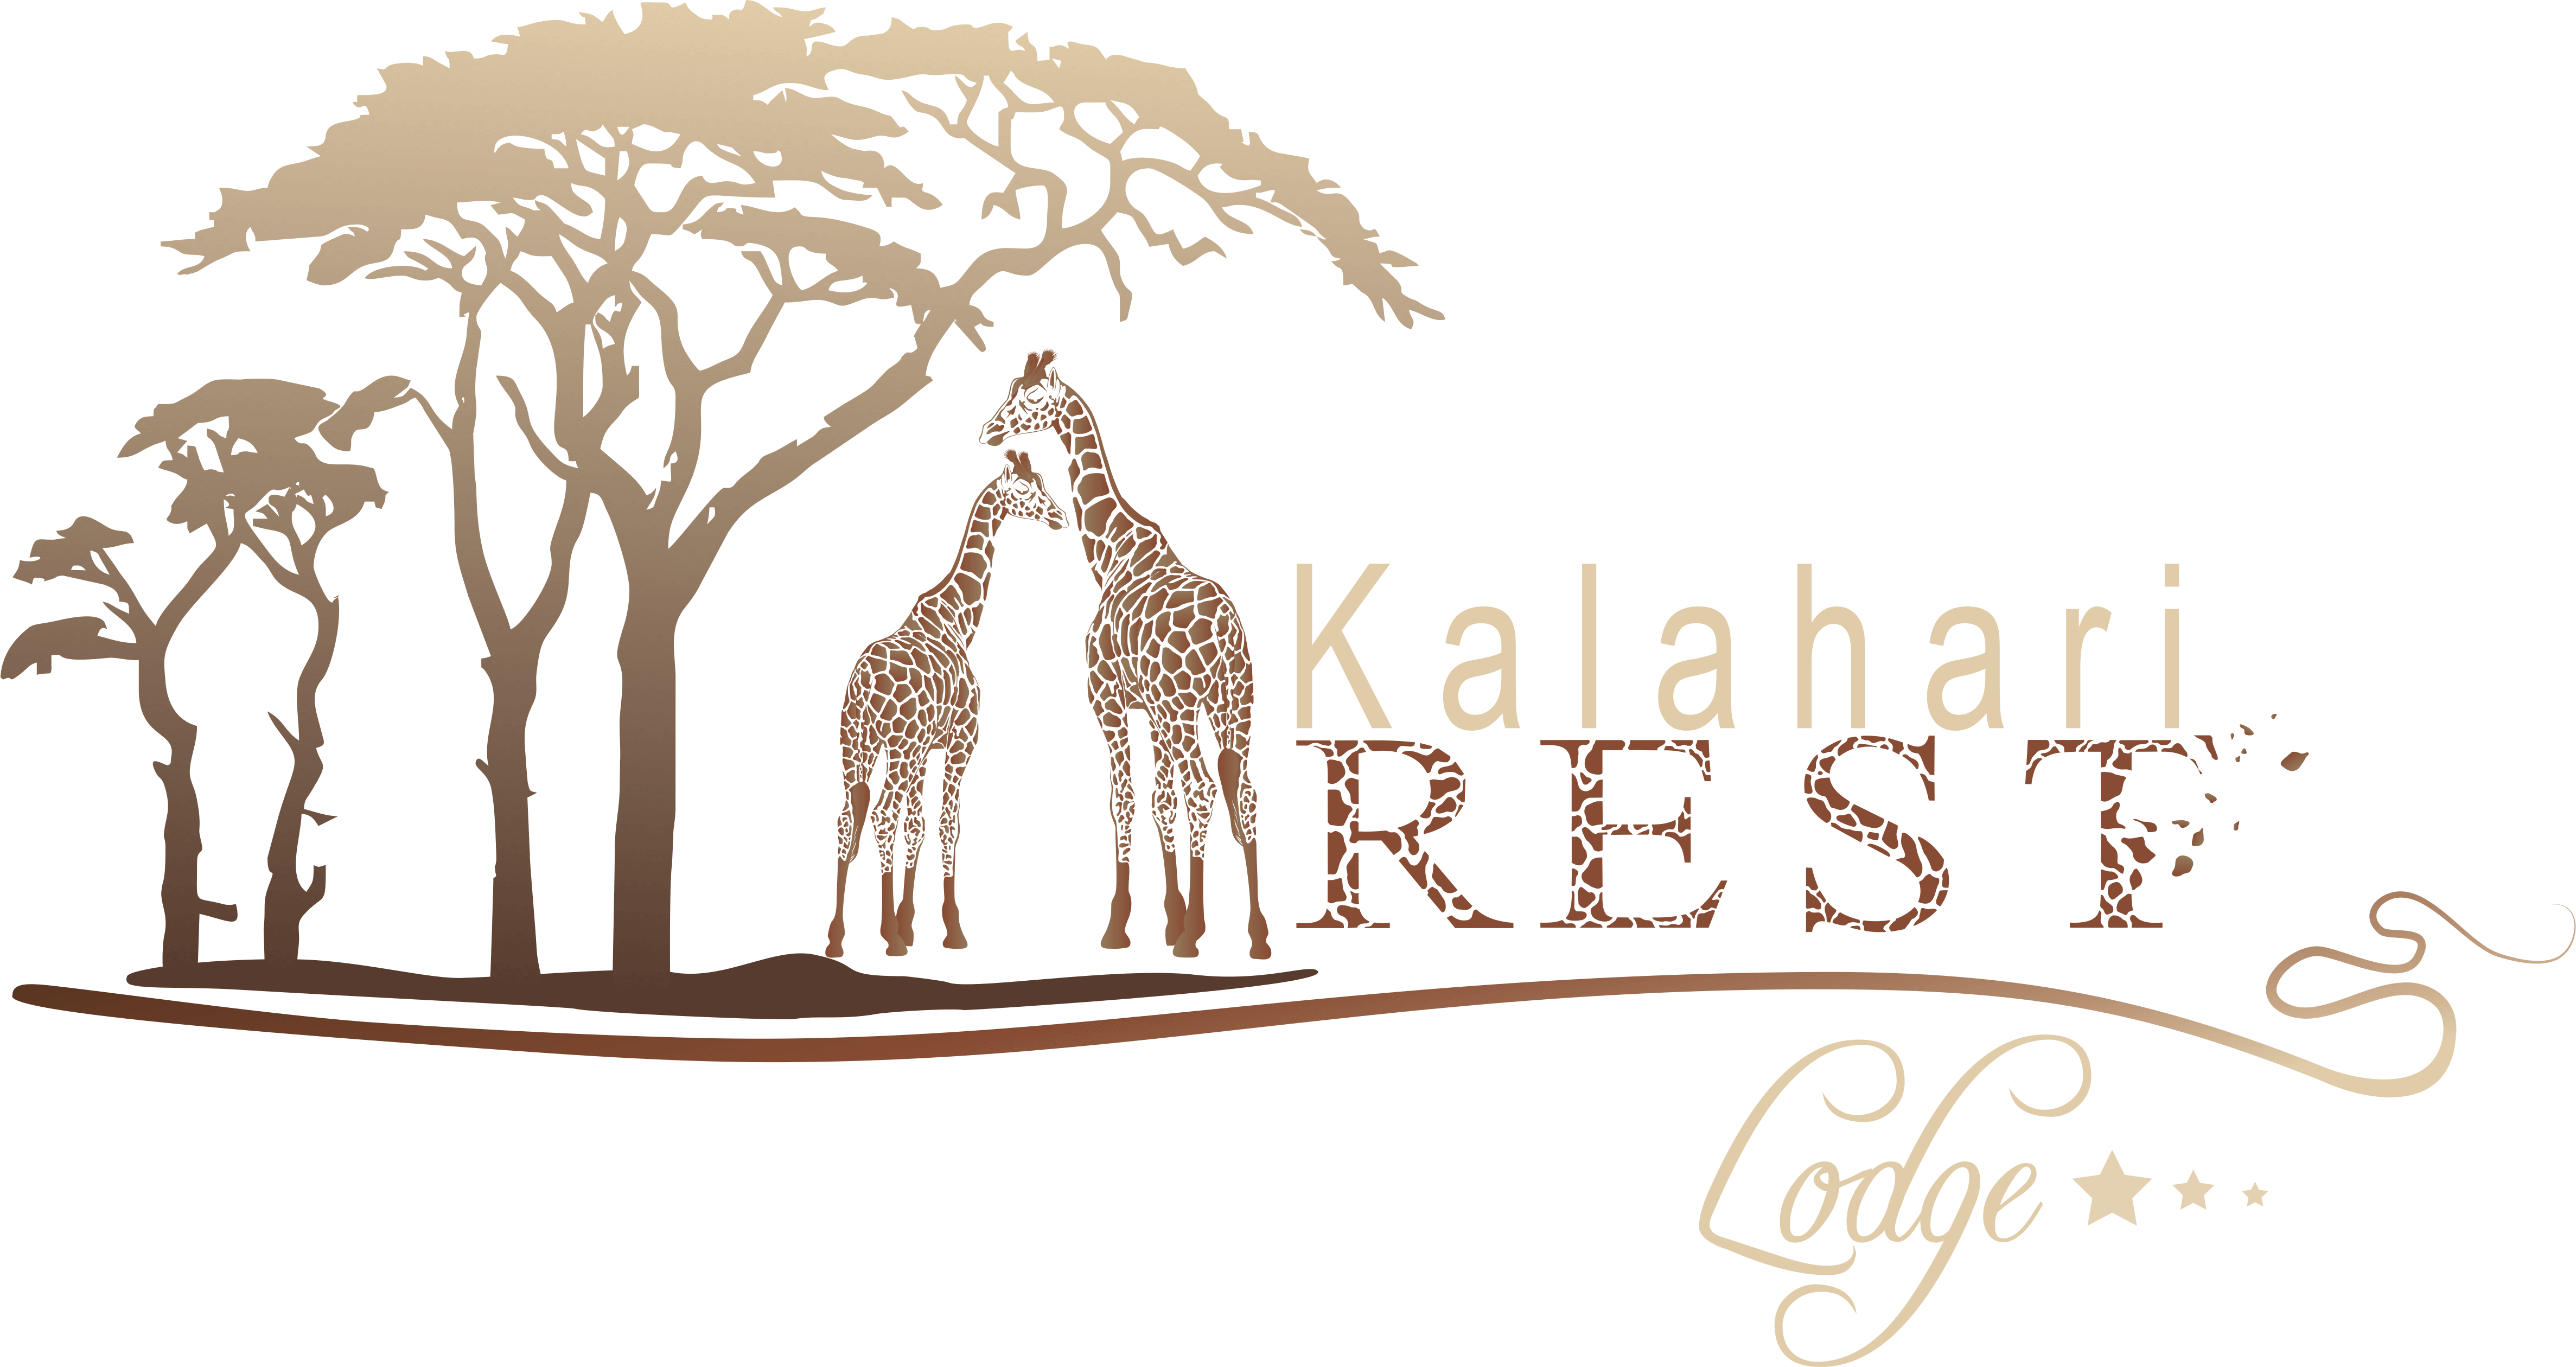 Kalahari Rest